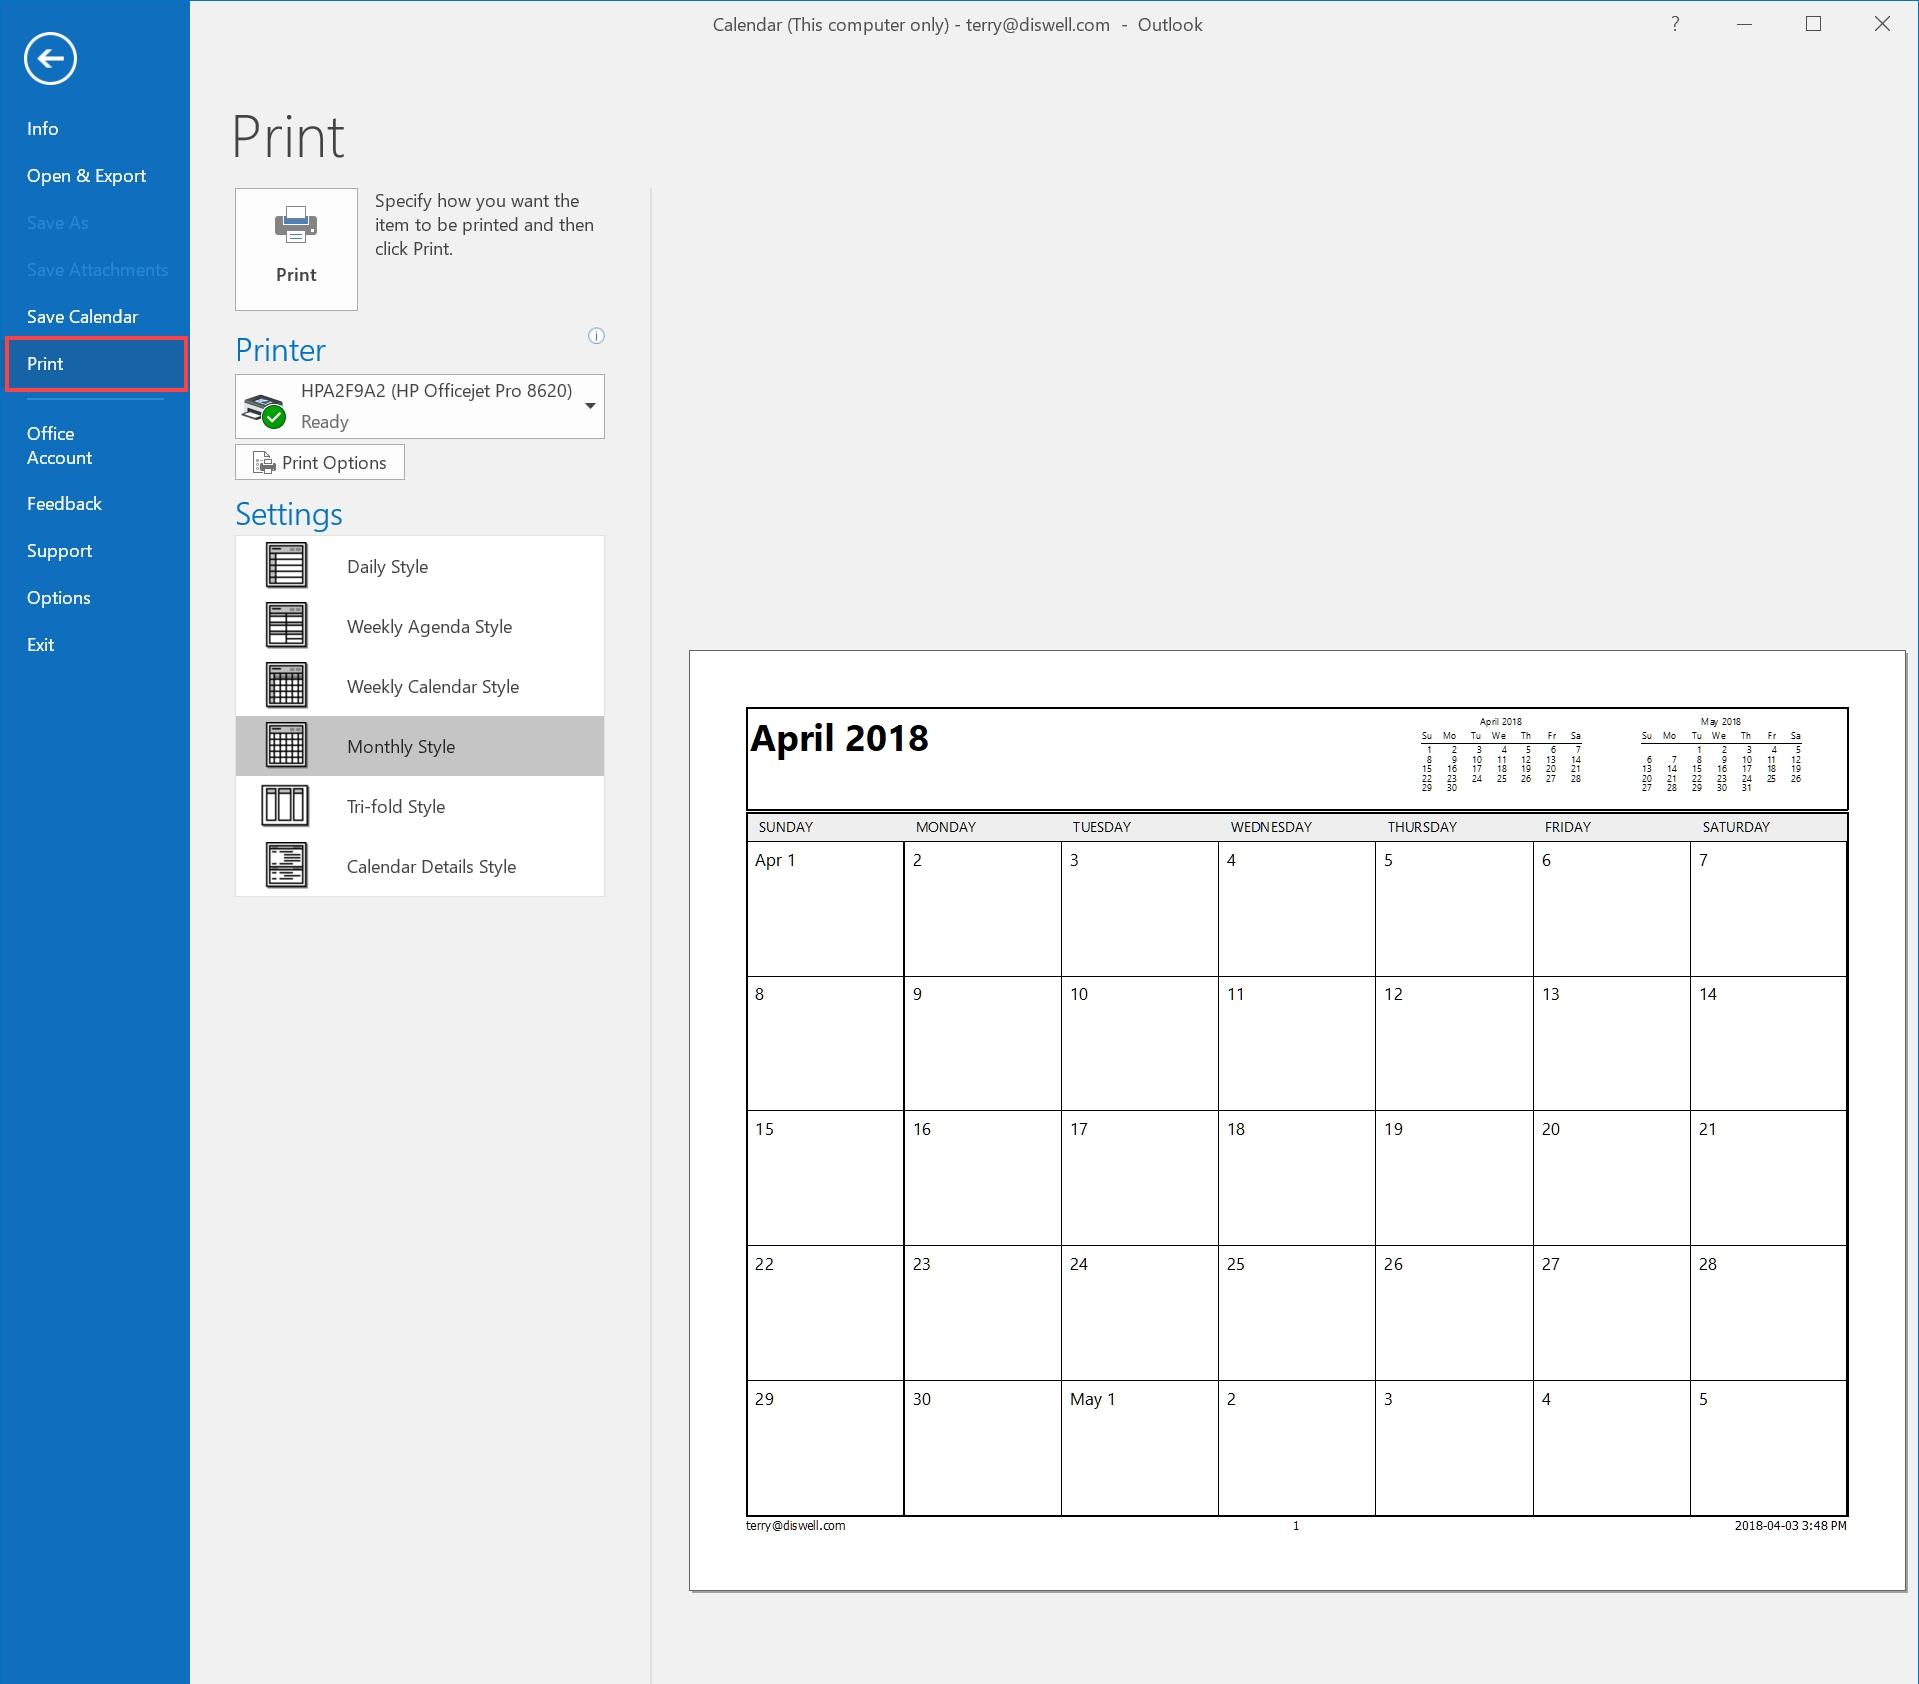 Print Calendar Range Outlook